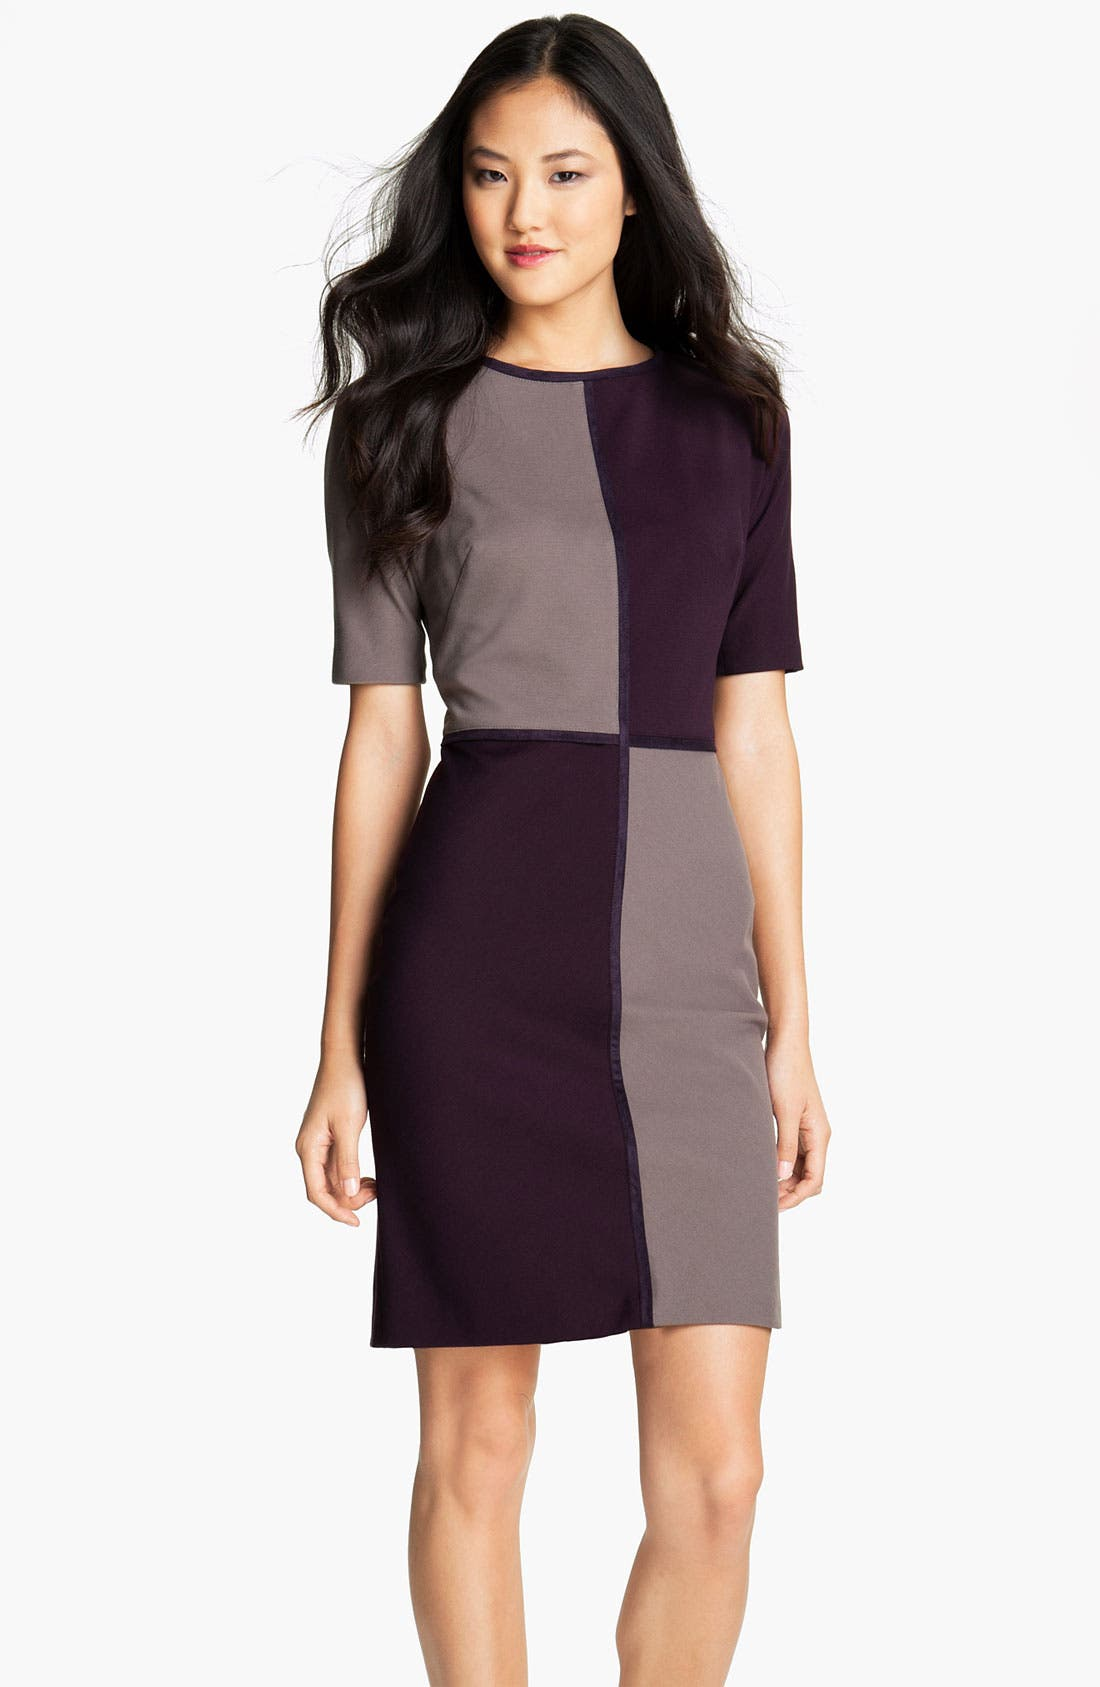 Main Image - Suzi Chin for Maggy Boutique Colorblock Sheath Dress (Petite)